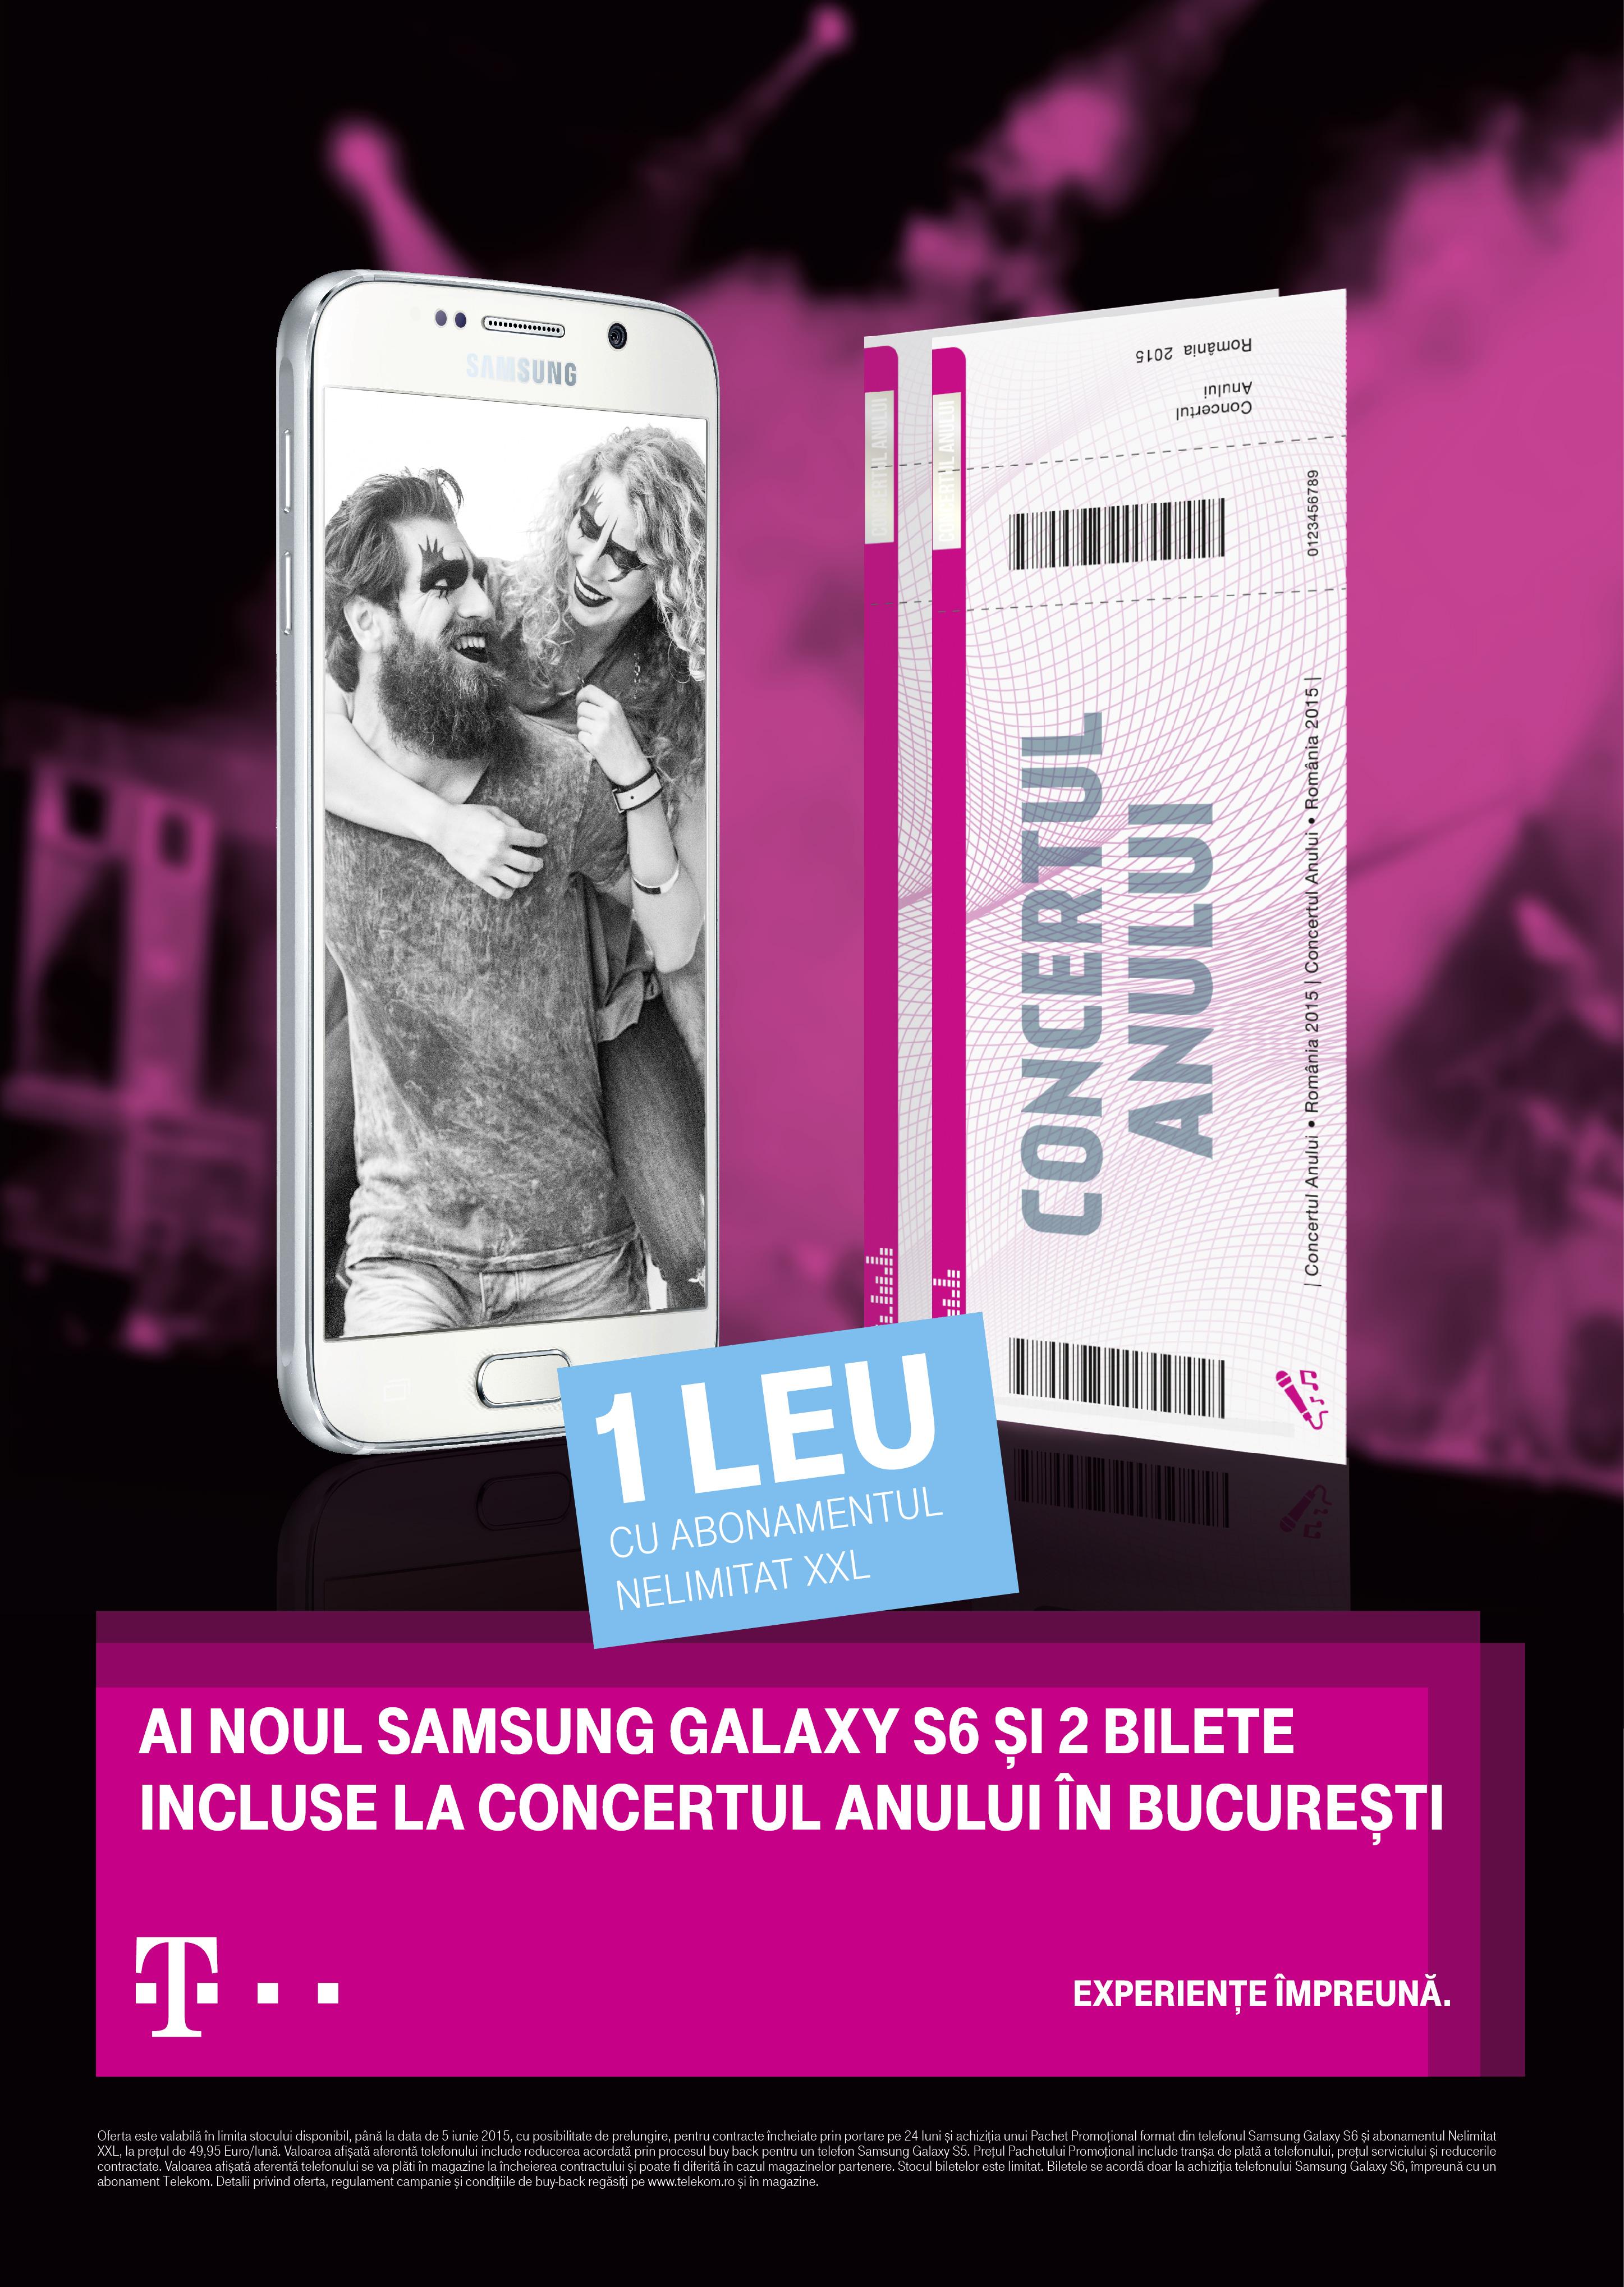 Telekom Romania_Samsung Galaxy S6_concertul anului